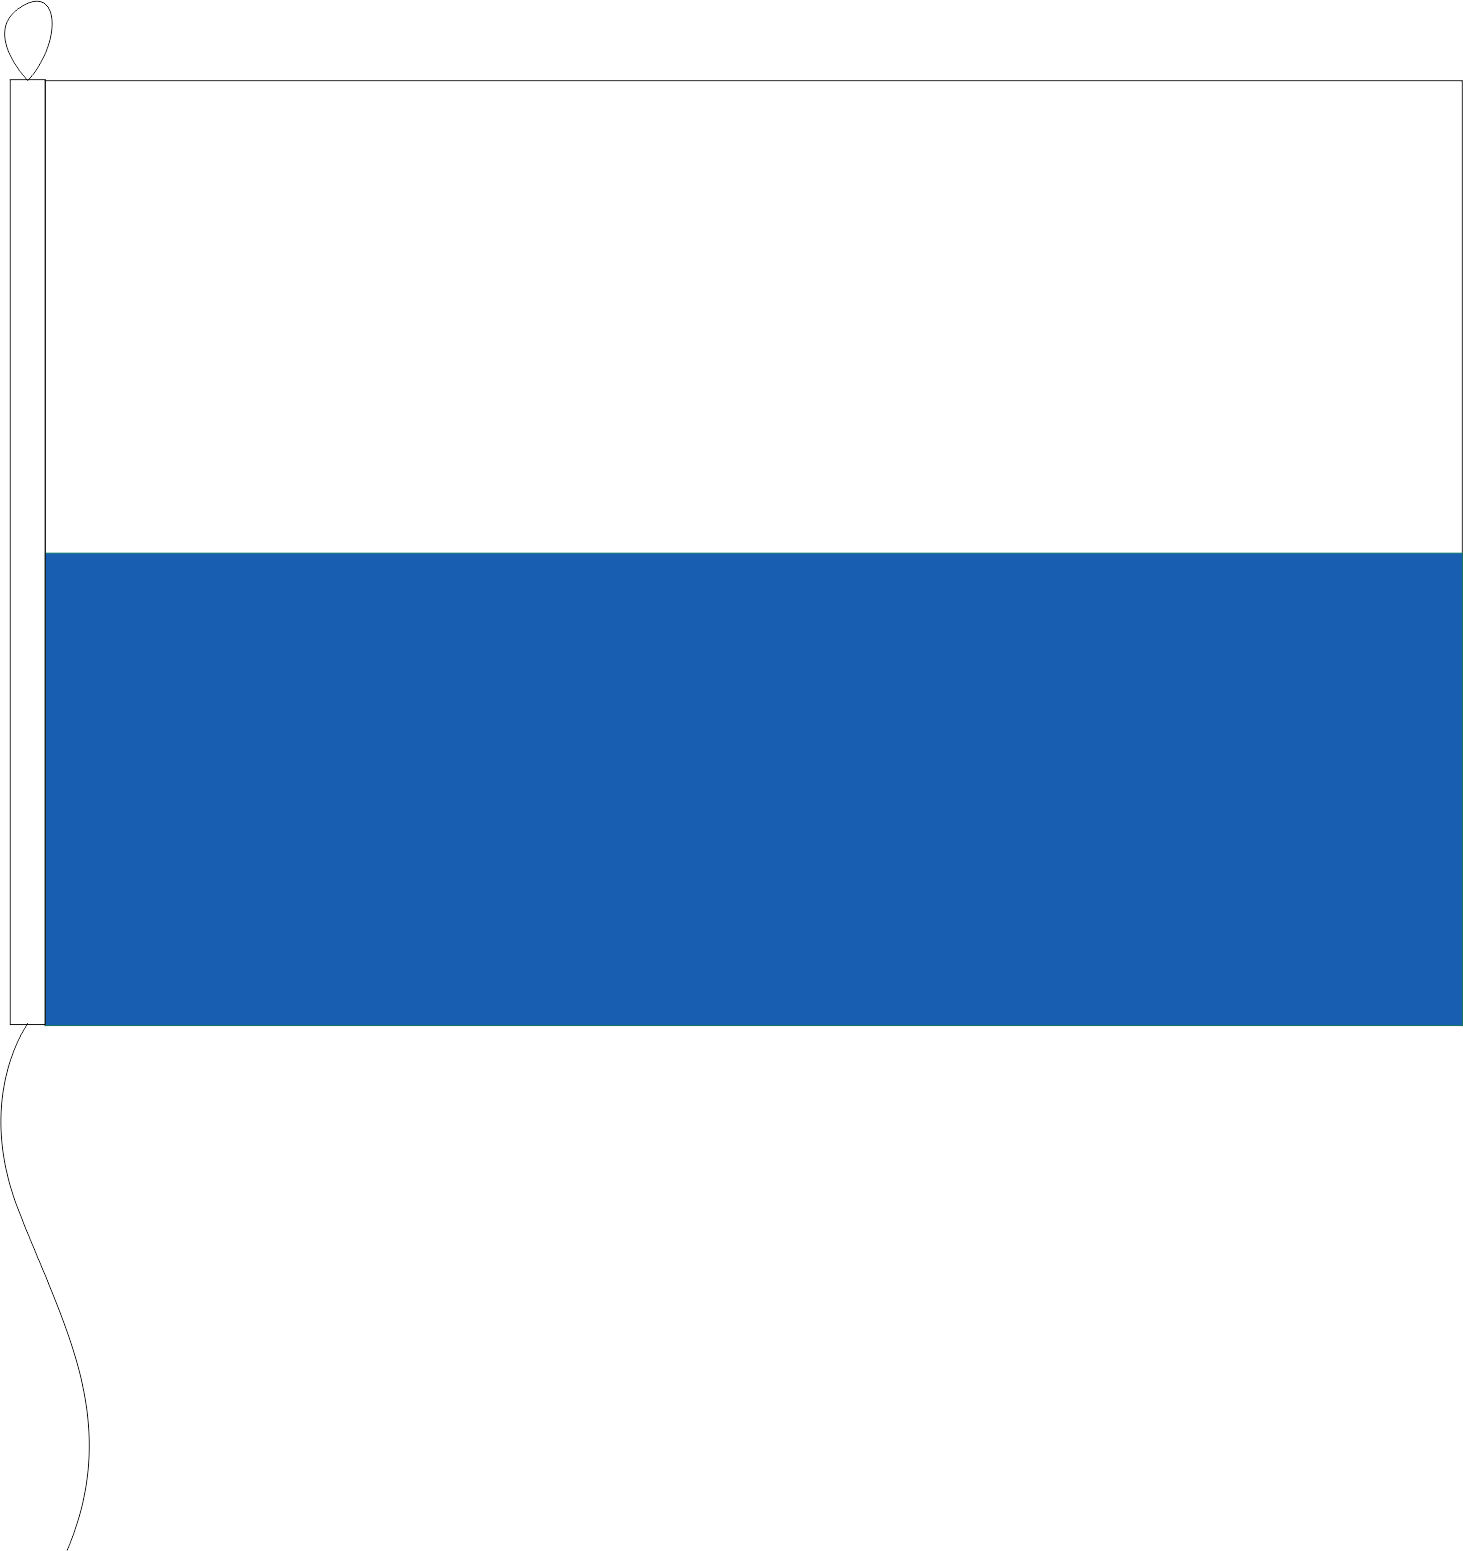 Flagge Bayern Weiß/blau 20 X 30 Cm Marinflag